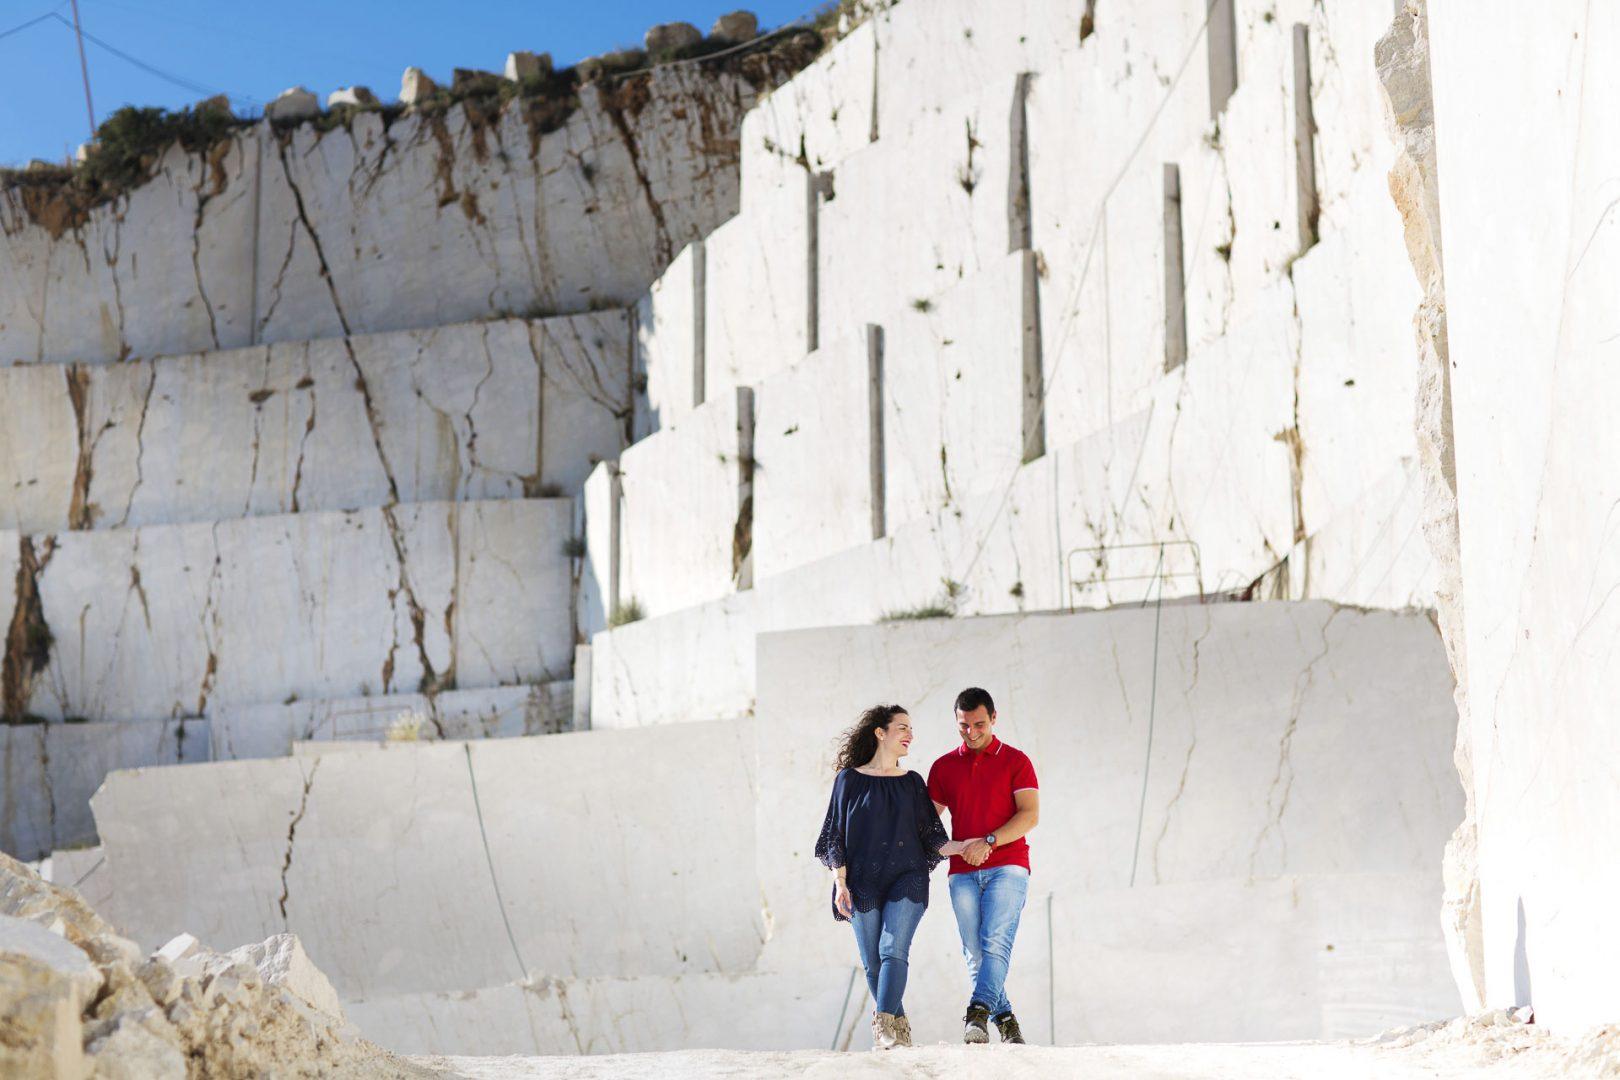 Sicily Engagement Photo Session By Nino Lombardo Photographer in Custonaci